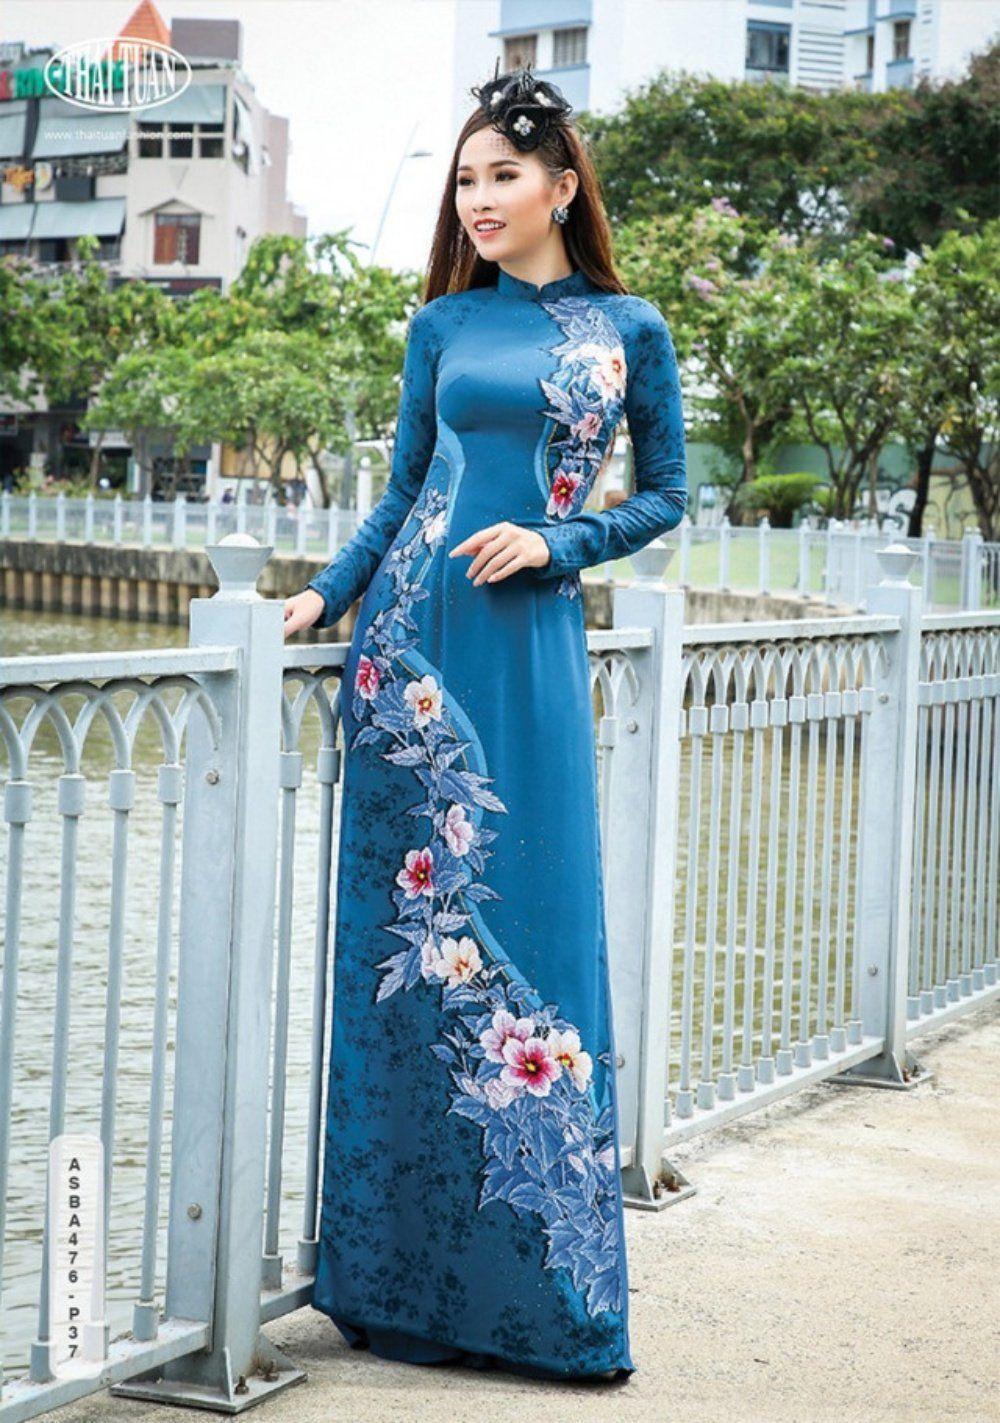 Custom made ao dai dress with pants. Vietnamese